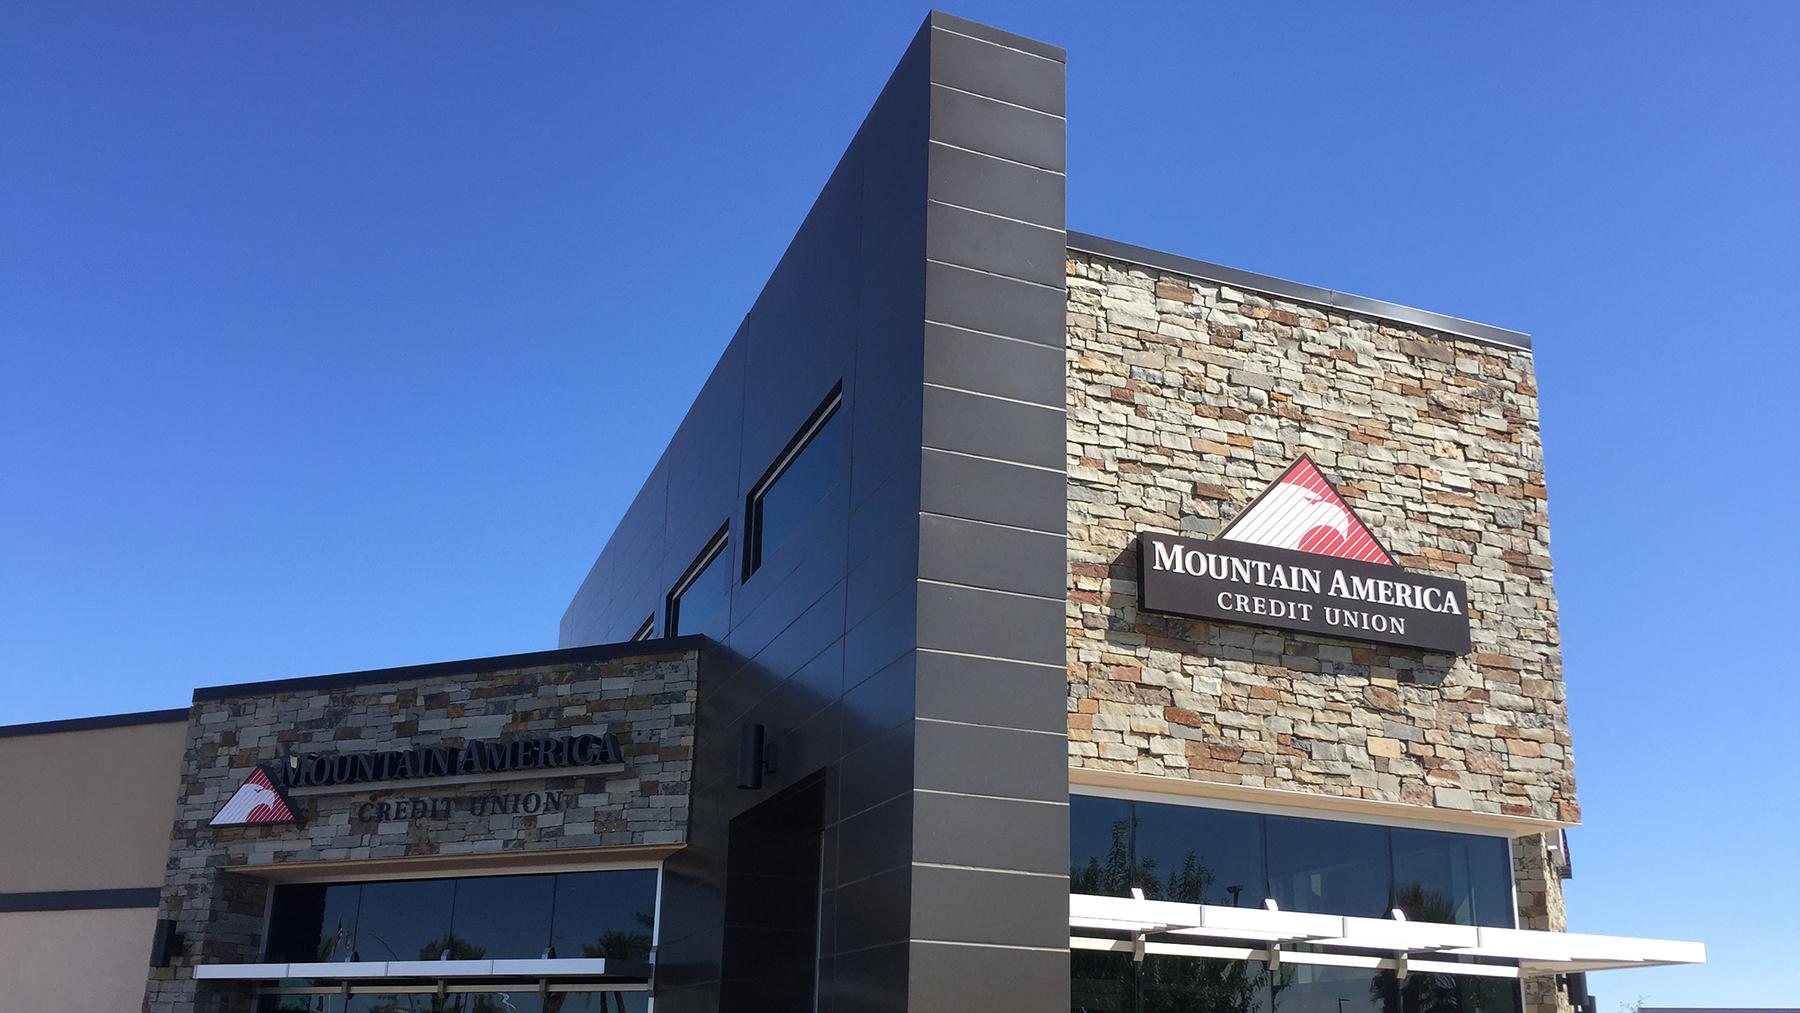 Mountain America Credit Union Architectural Building